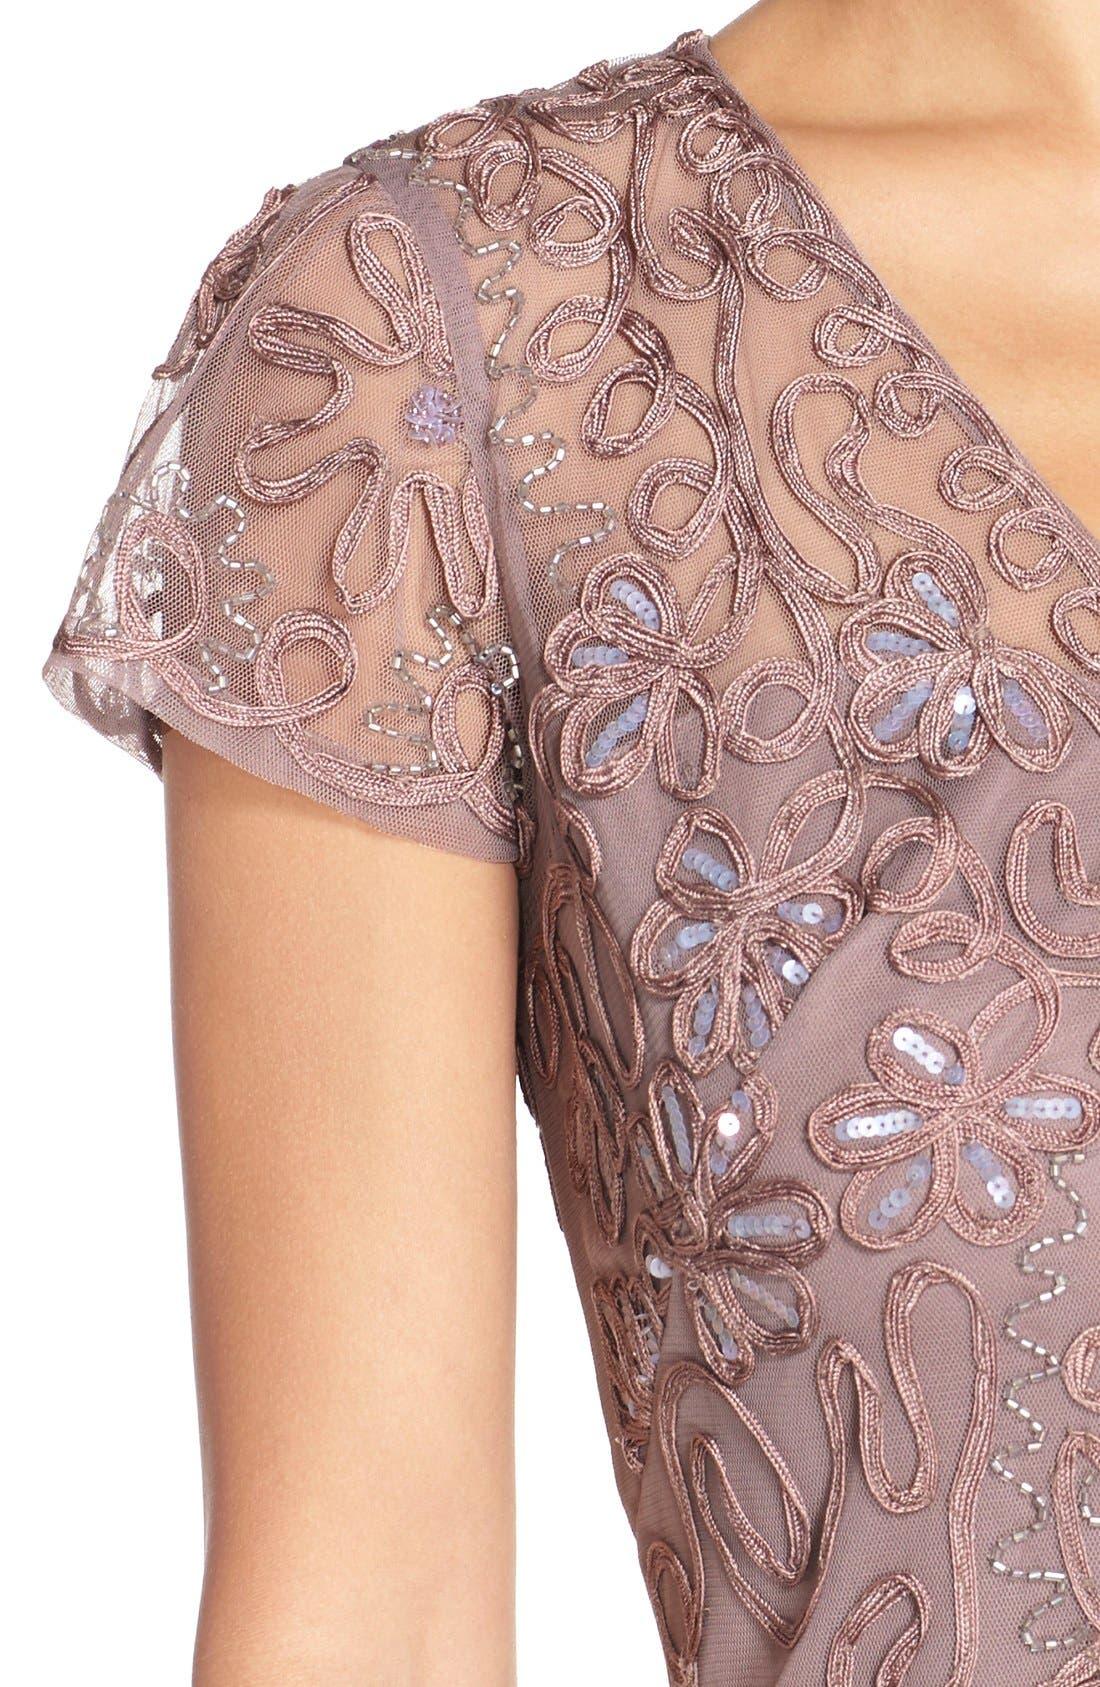 Embellished Soutache Sheath Dress,                             Alternate thumbnail 5, color,                             Dusty Lavender